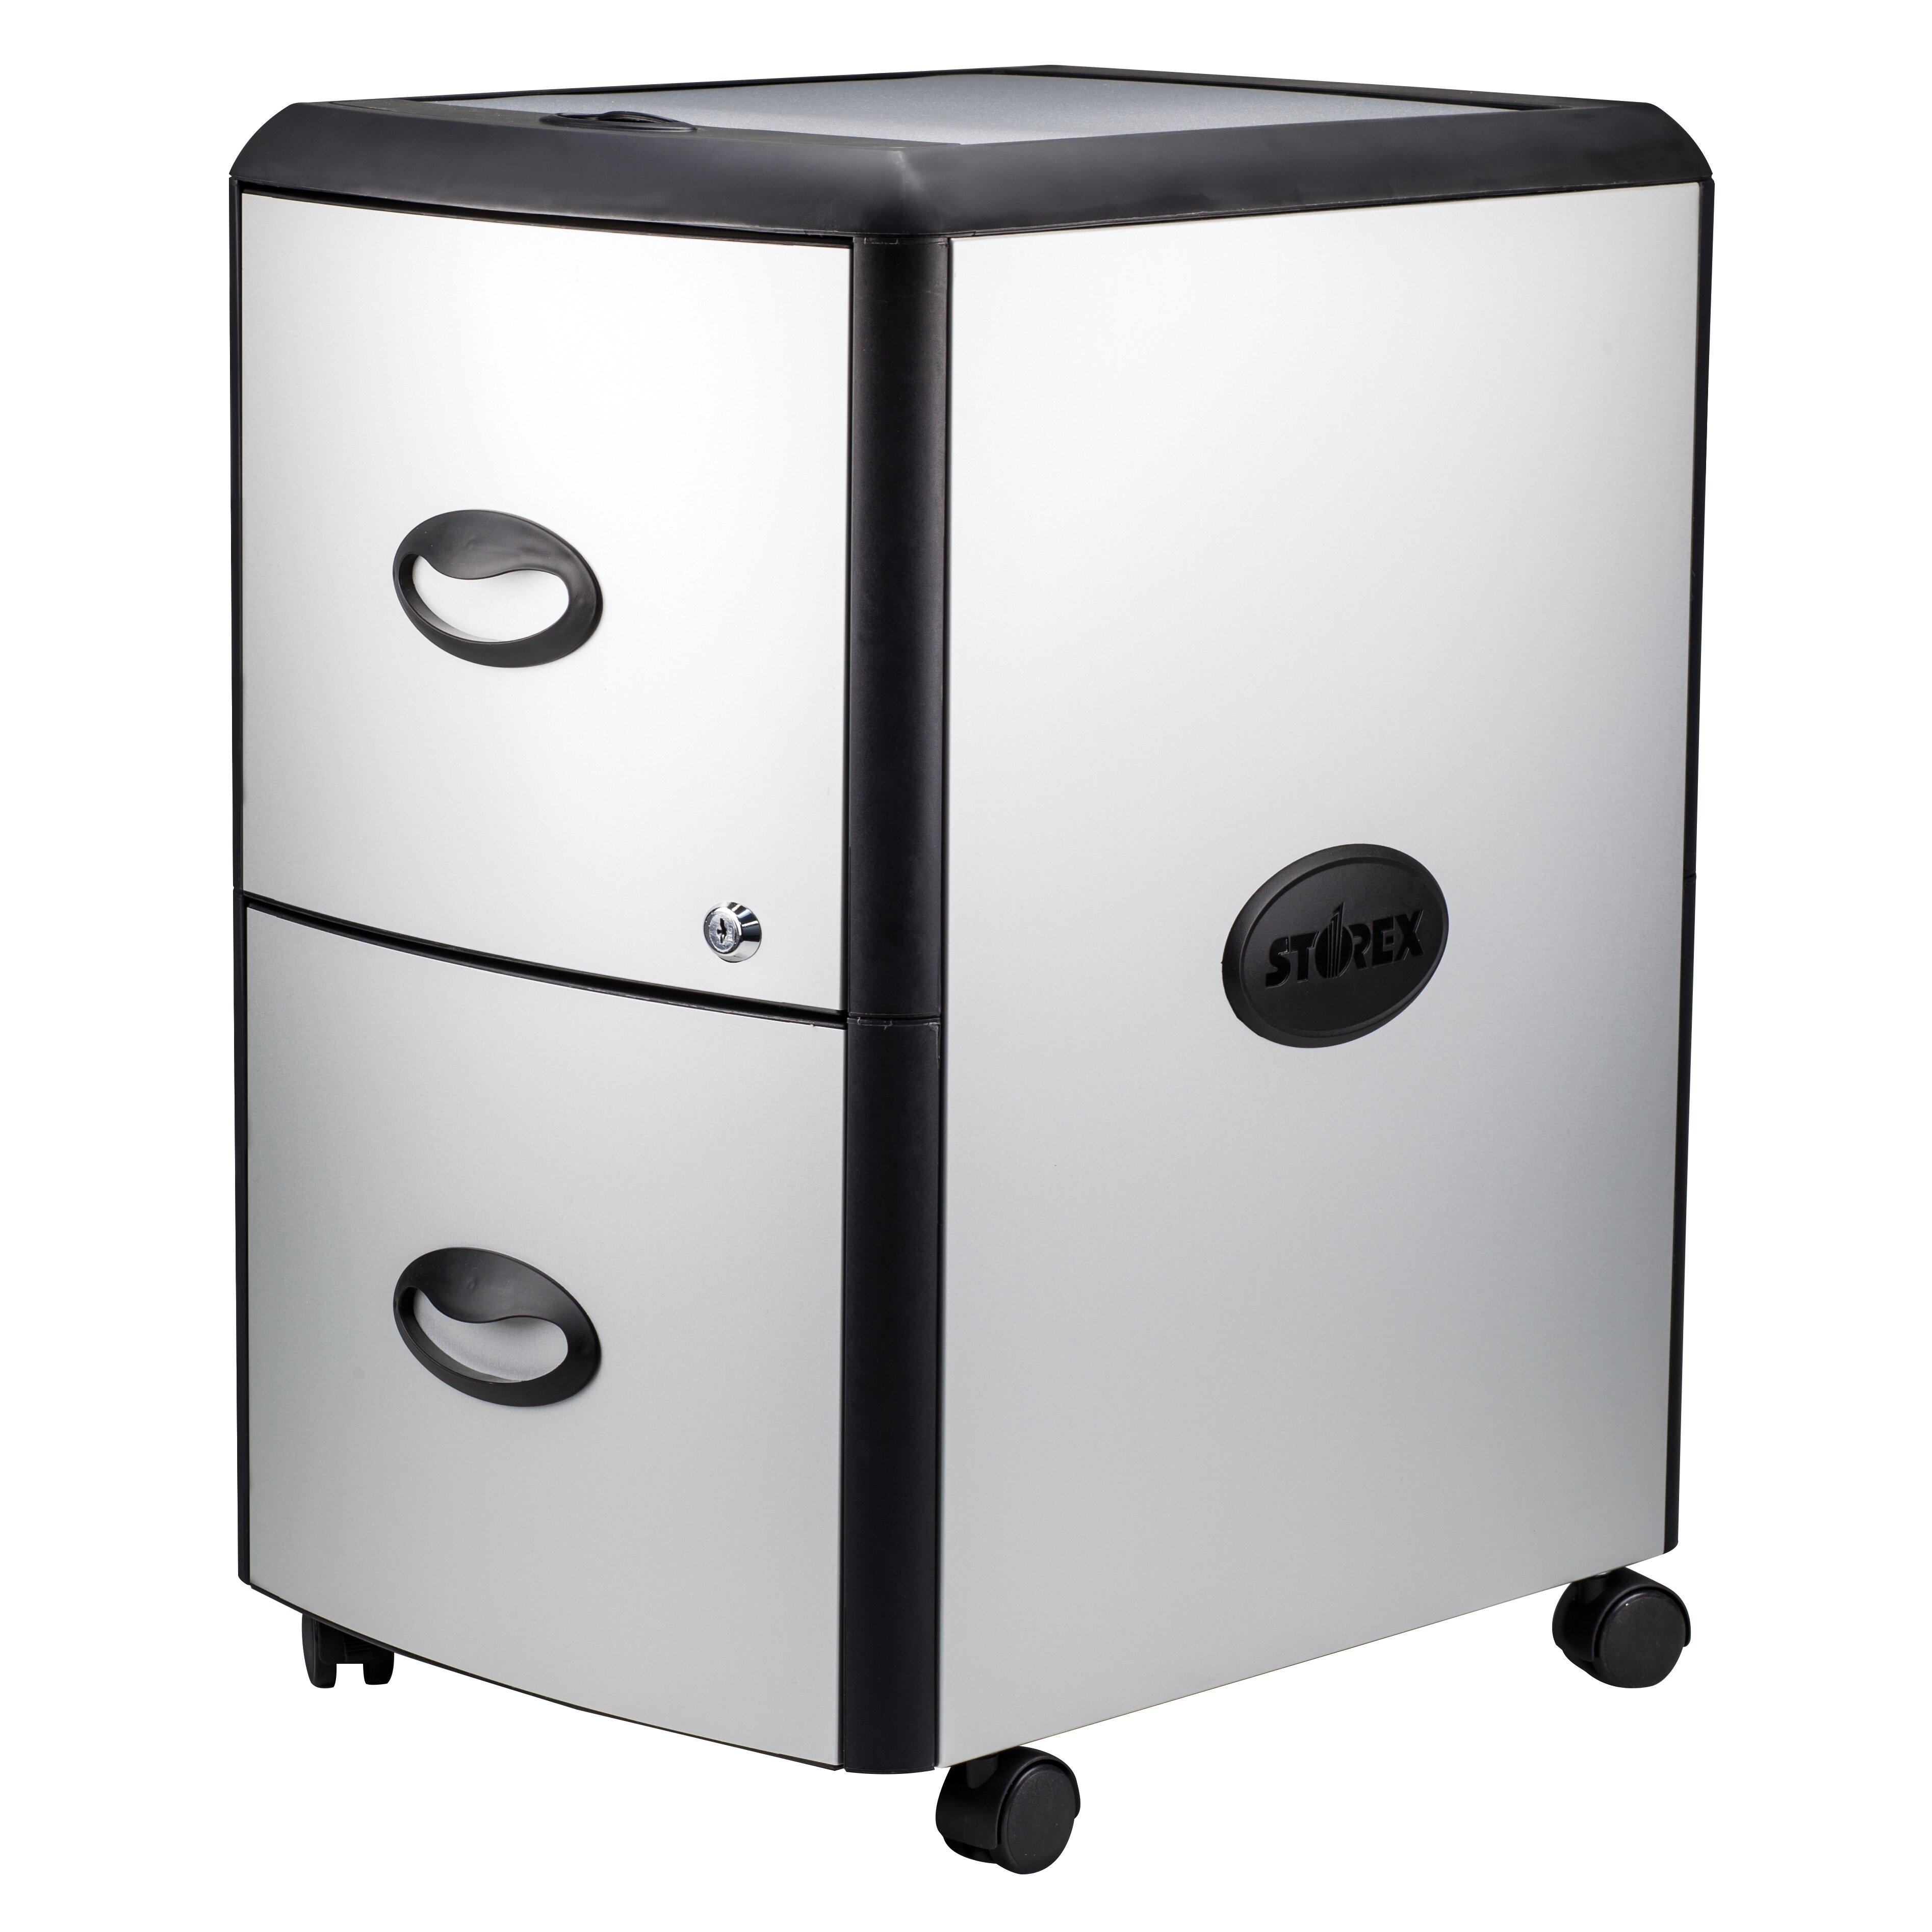 storex 2 drawer storage chest reviews wayfair. Black Bedroom Furniture Sets. Home Design Ideas